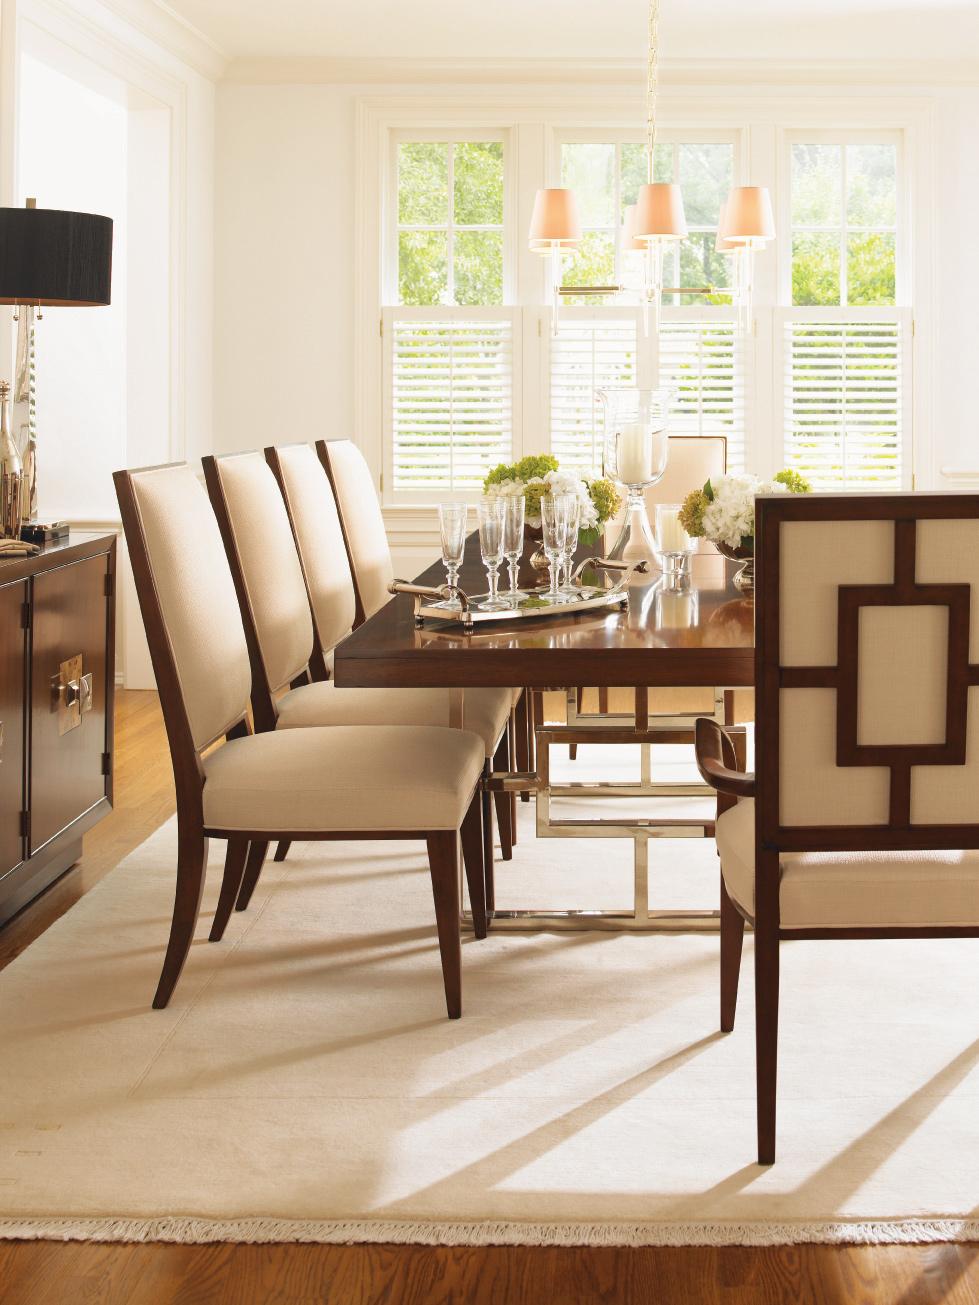 Astonishing Mirage Monroe Rectangular Double Pedestal Dining Table Set Inzonedesignstudio Interior Chair Design Inzonedesignstudiocom